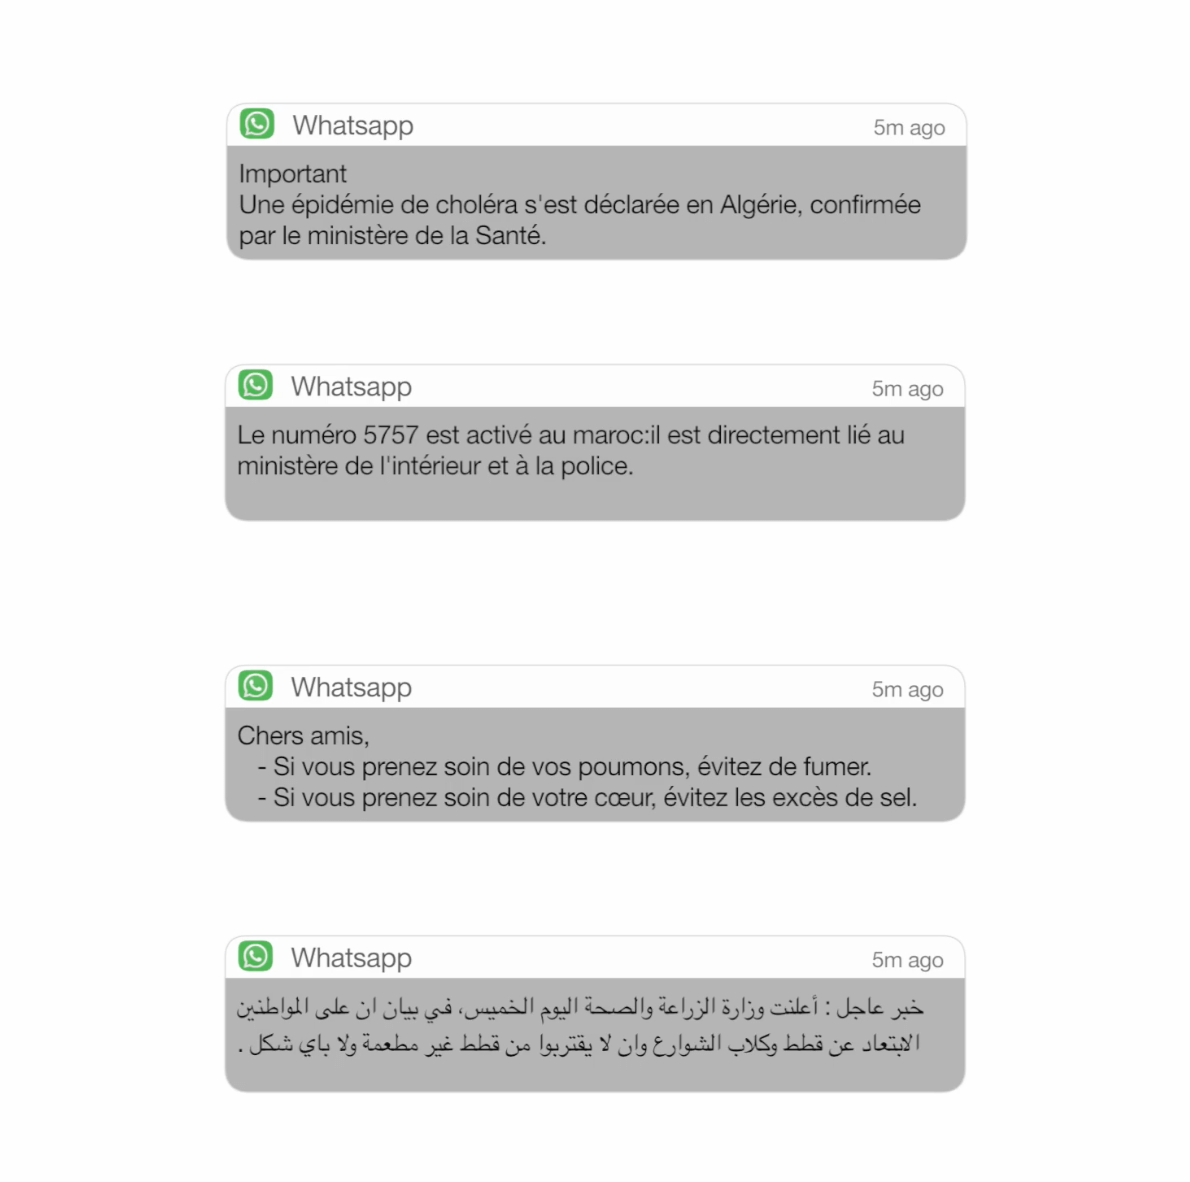 Whatsapp Messaging Alerts